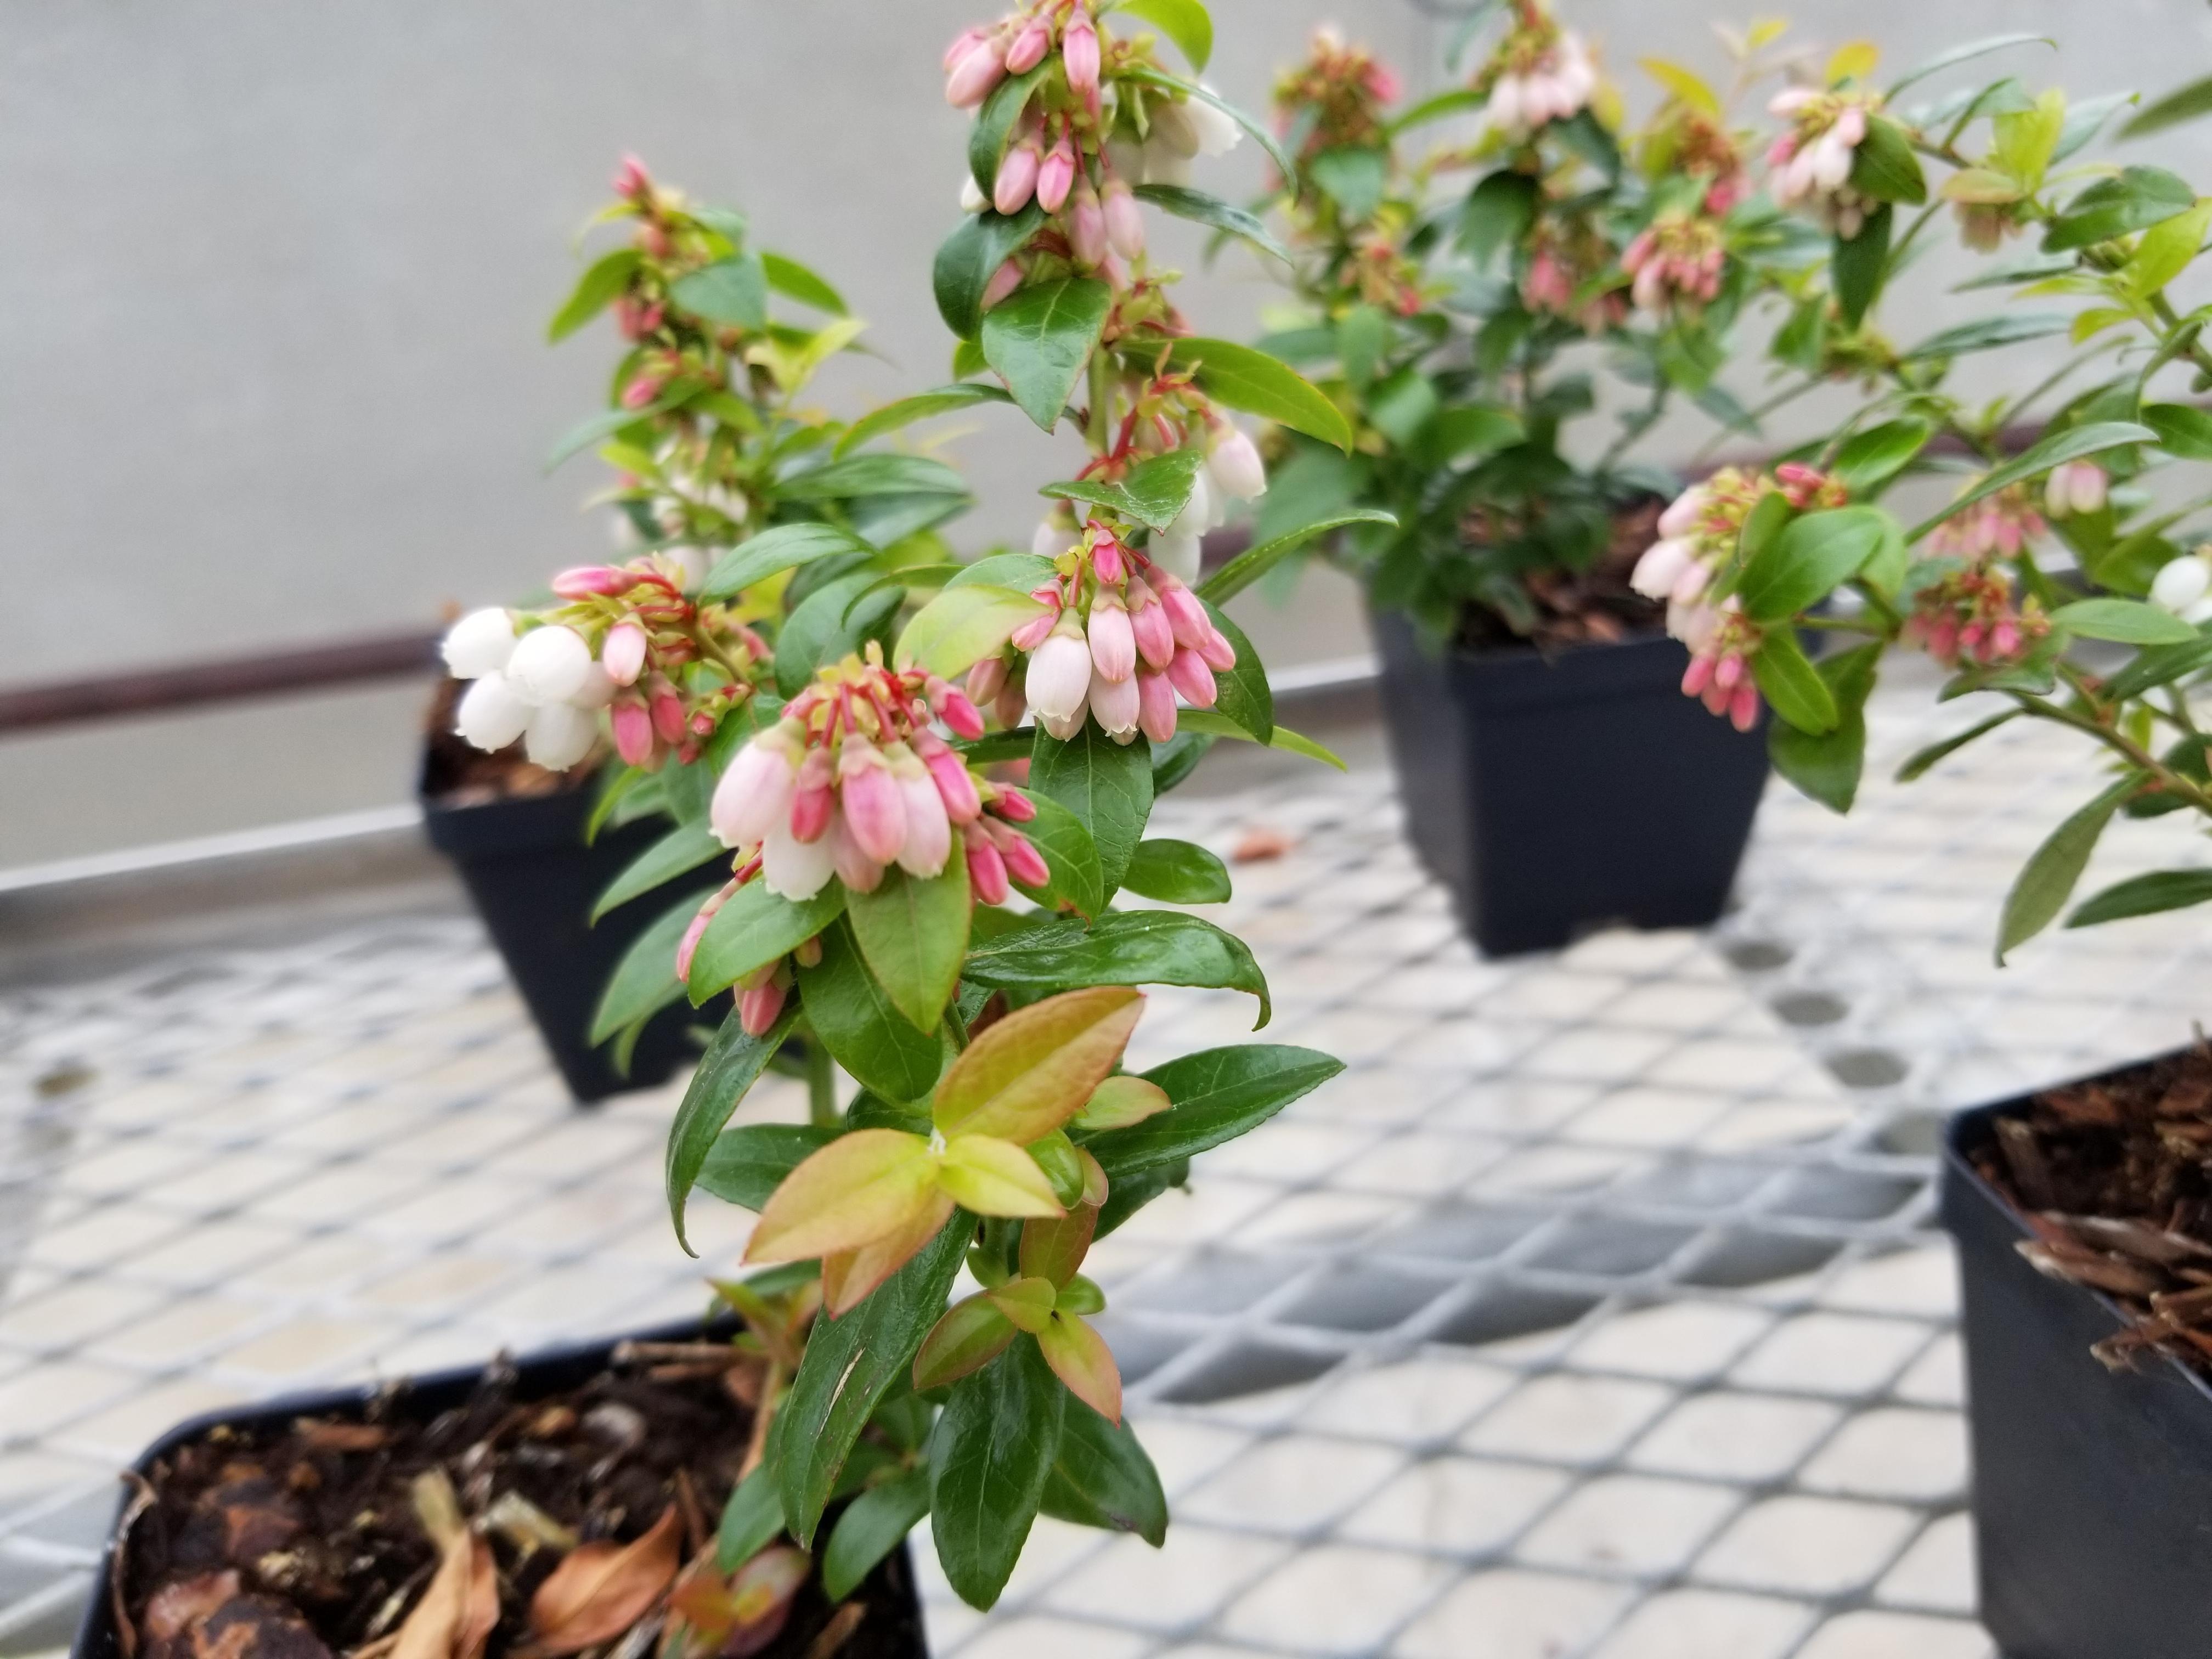 Blueberry flowers (Vaccinium hybrid) [4032x3024] [OC